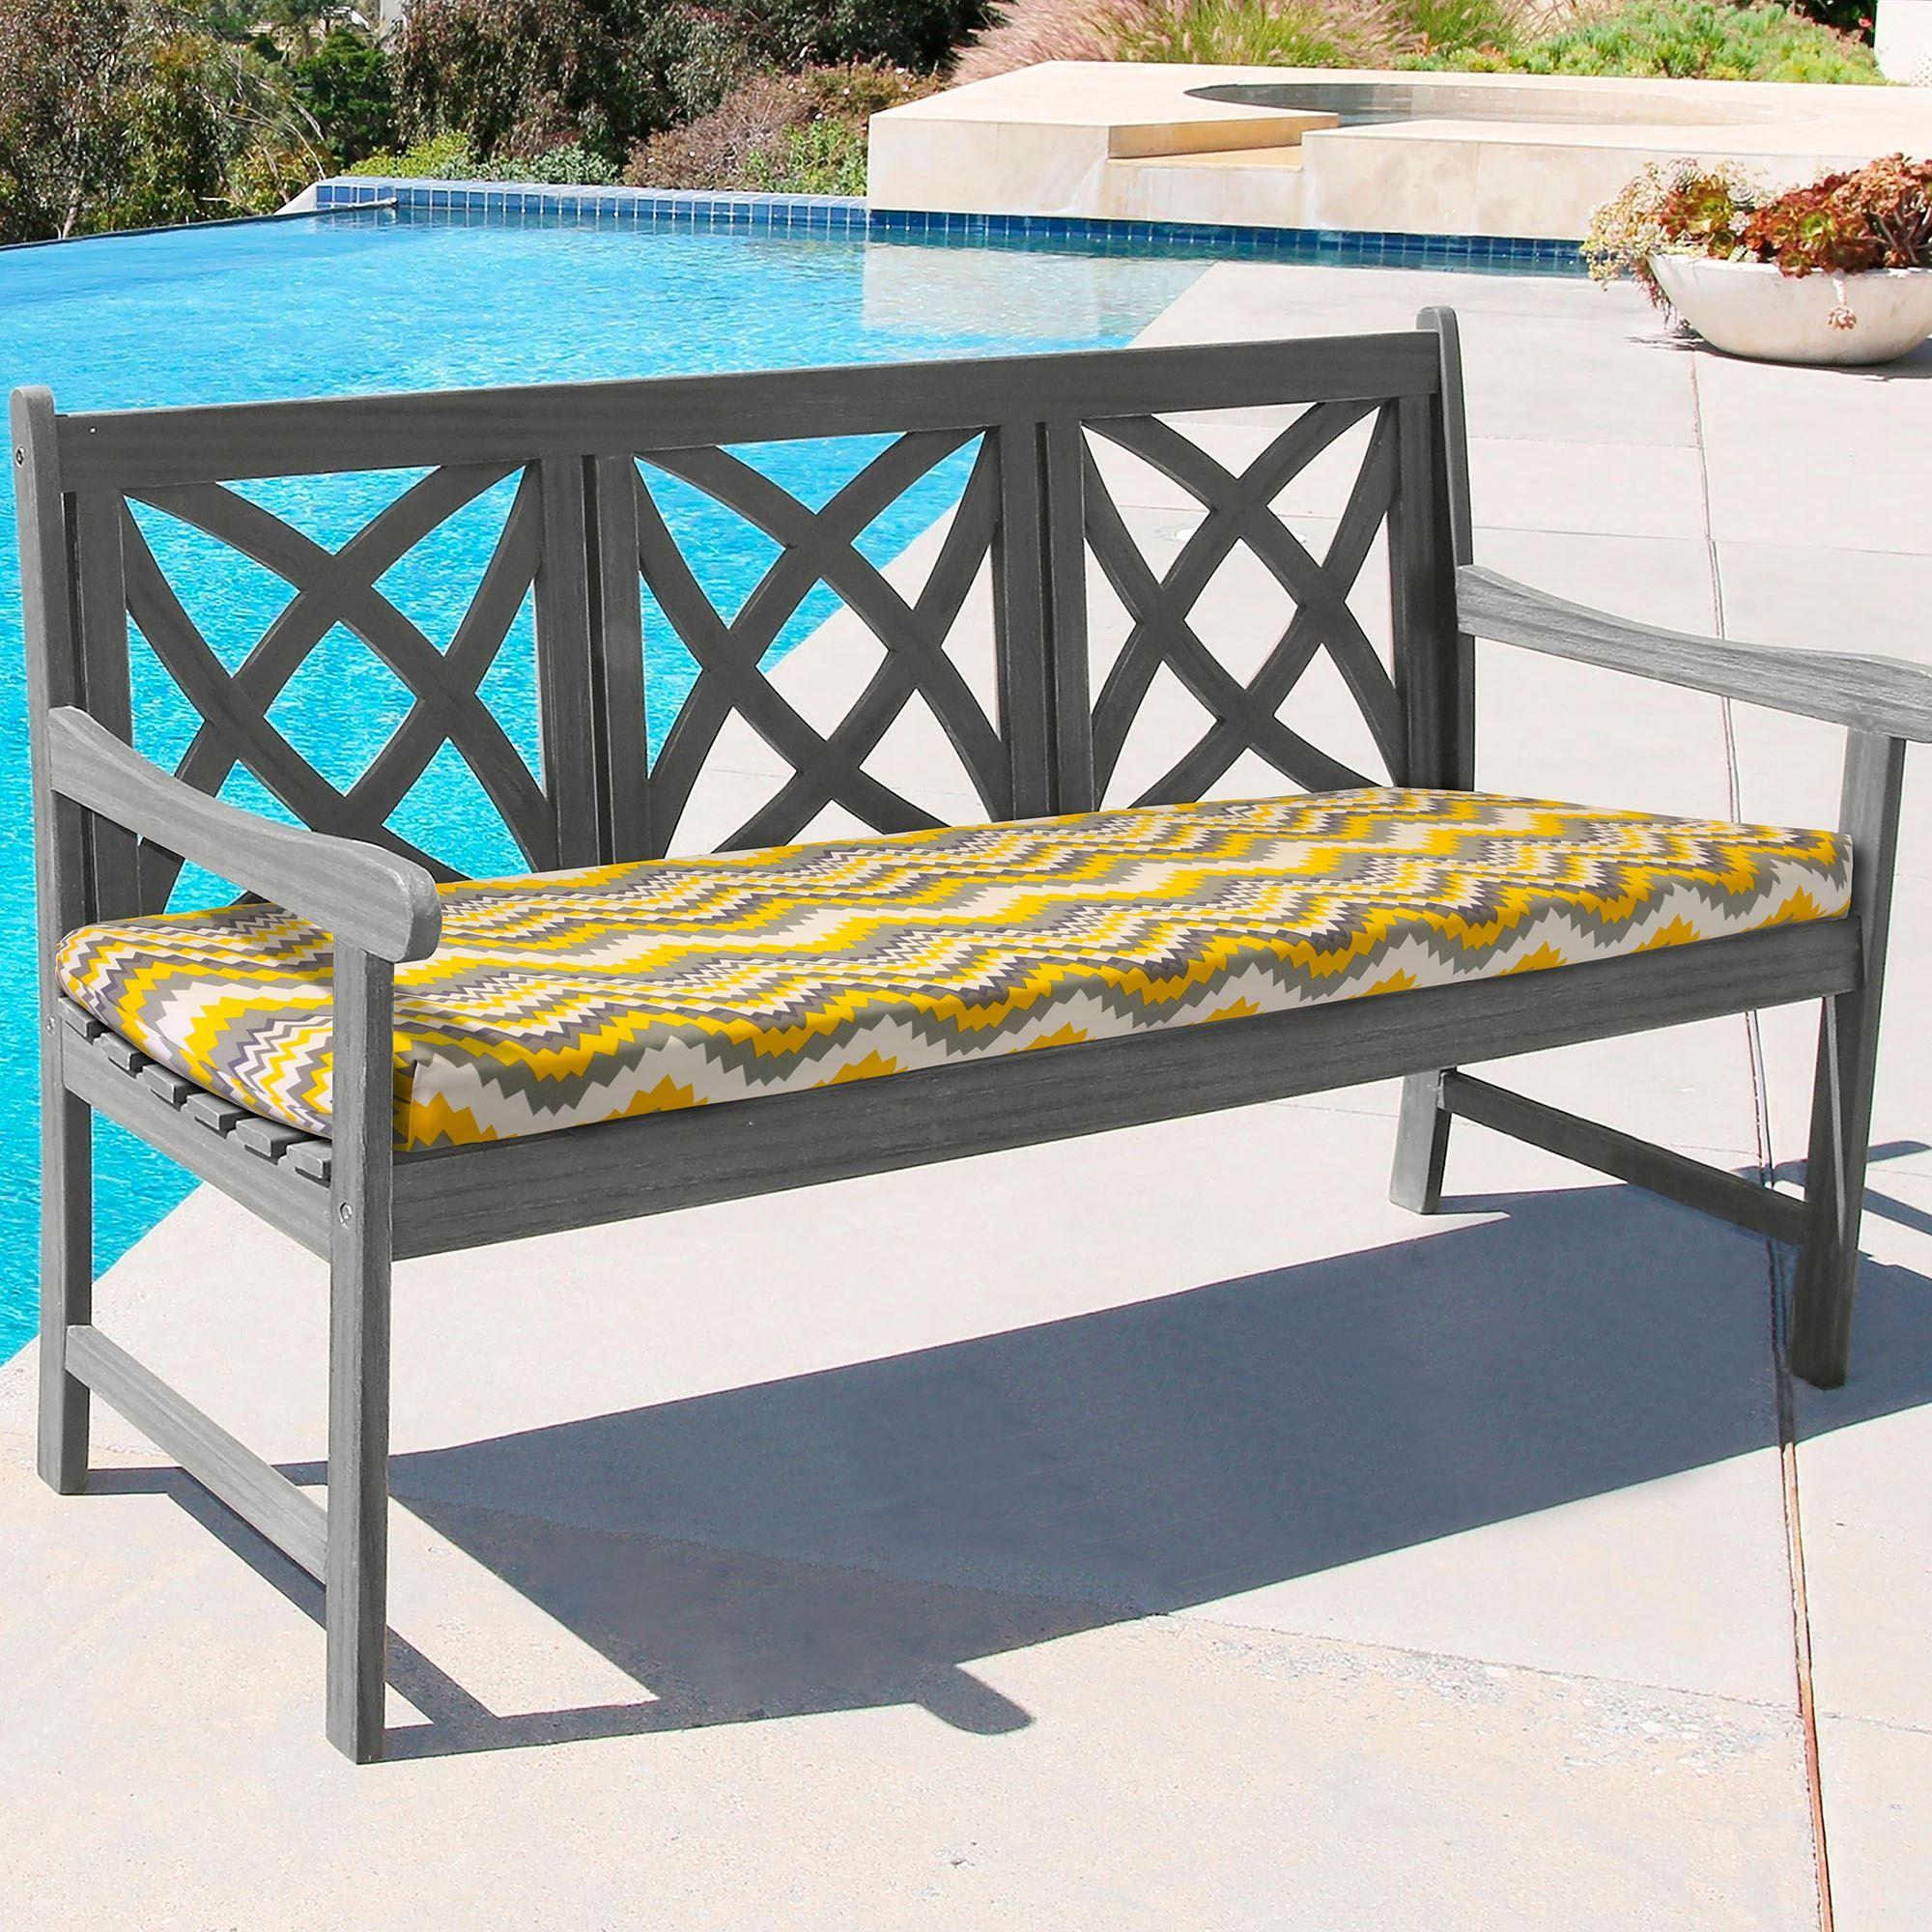 Outstanding Portola Reversible Chevron Indoor Outdoor Bench Seat Cushion Creativecarmelina Interior Chair Design Creativecarmelinacom